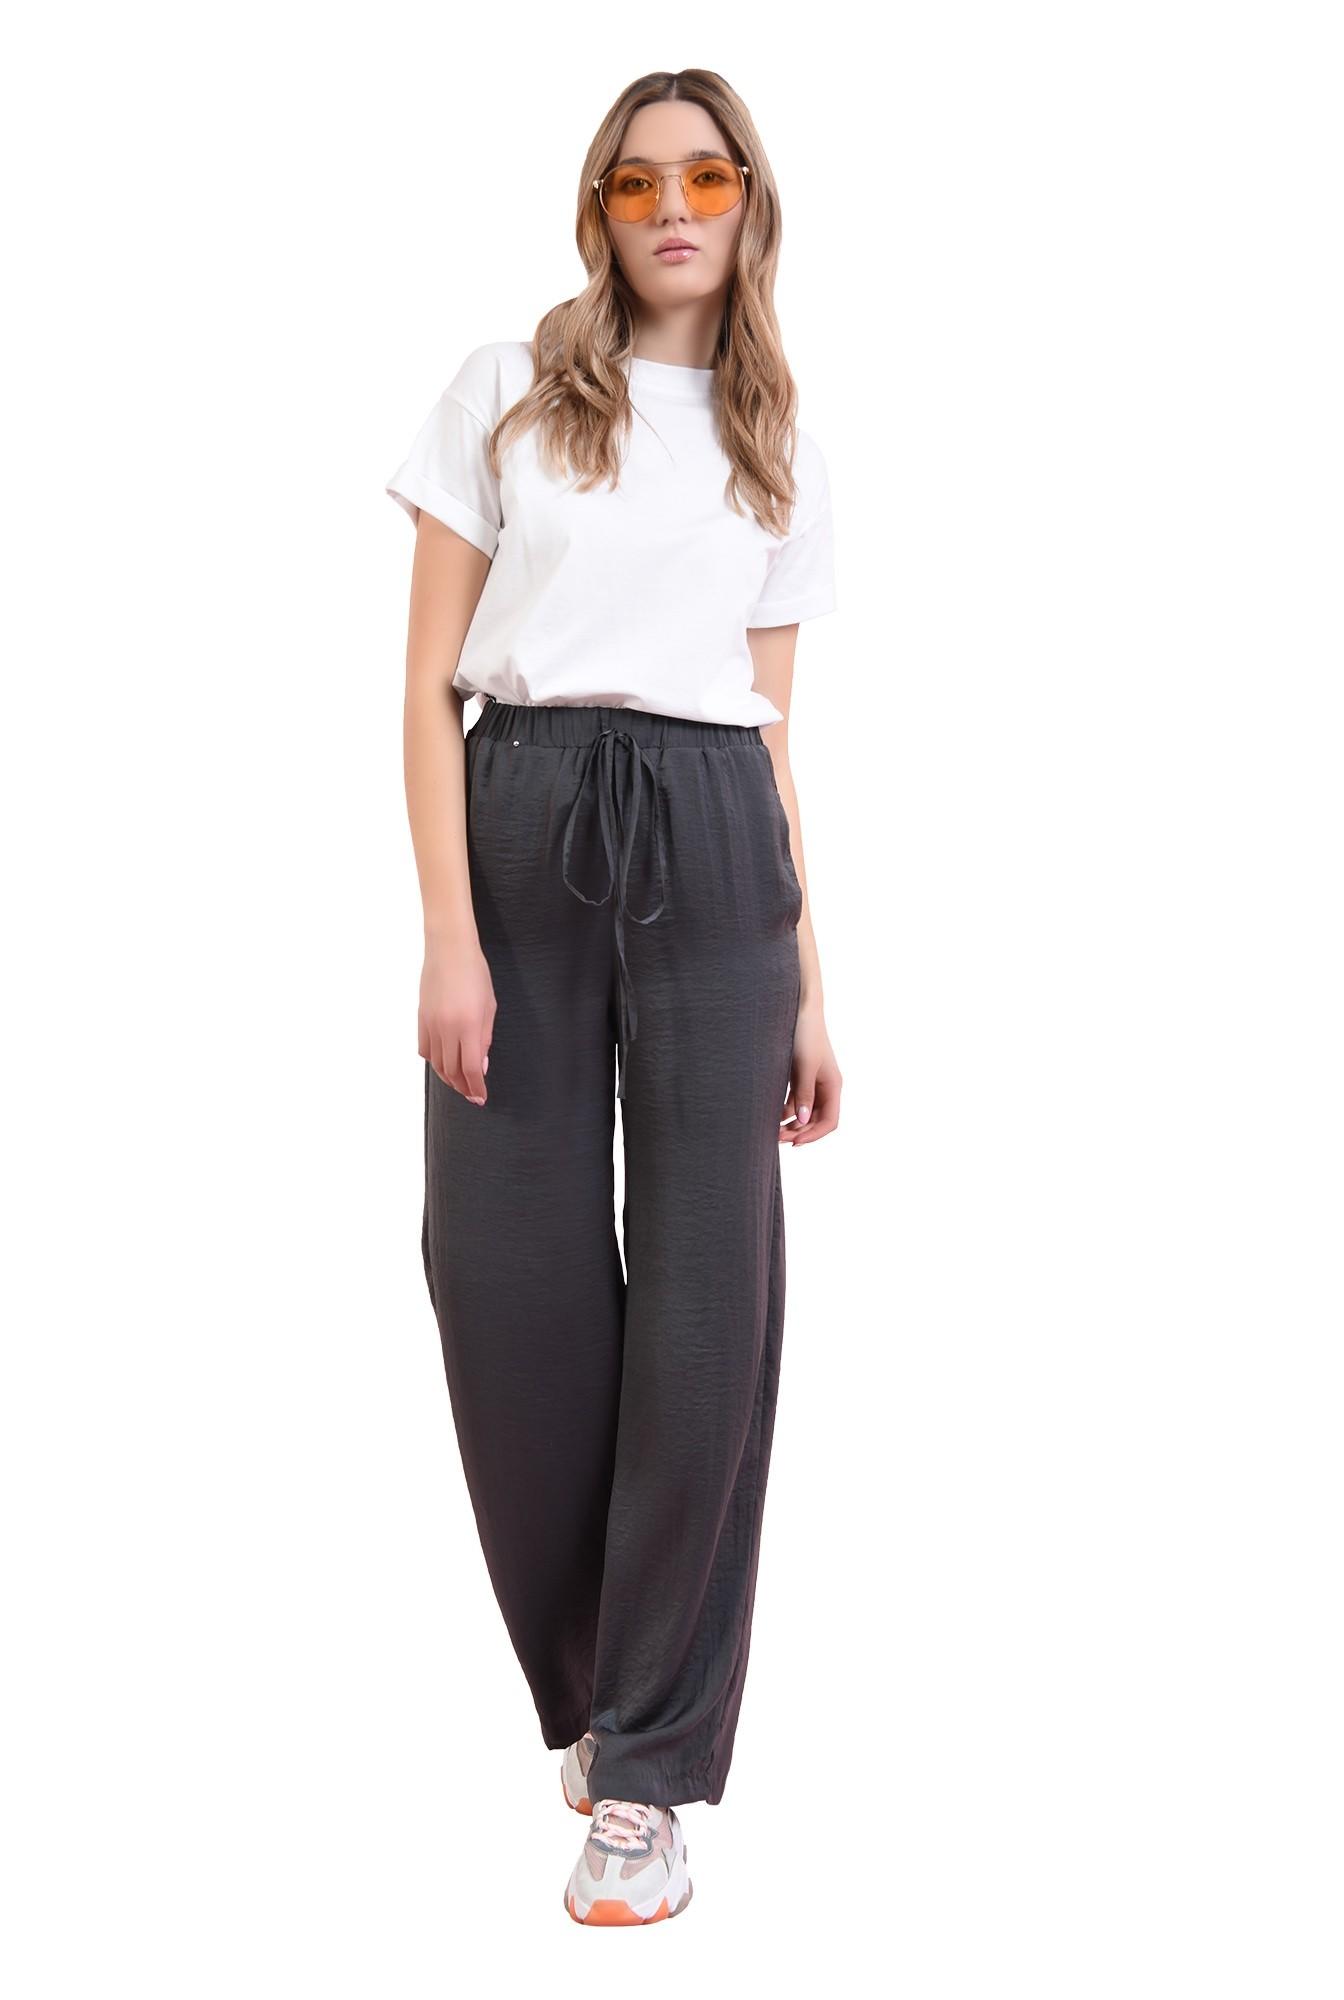 3 -  pantaloni gri, din satin, evazati, cu snur